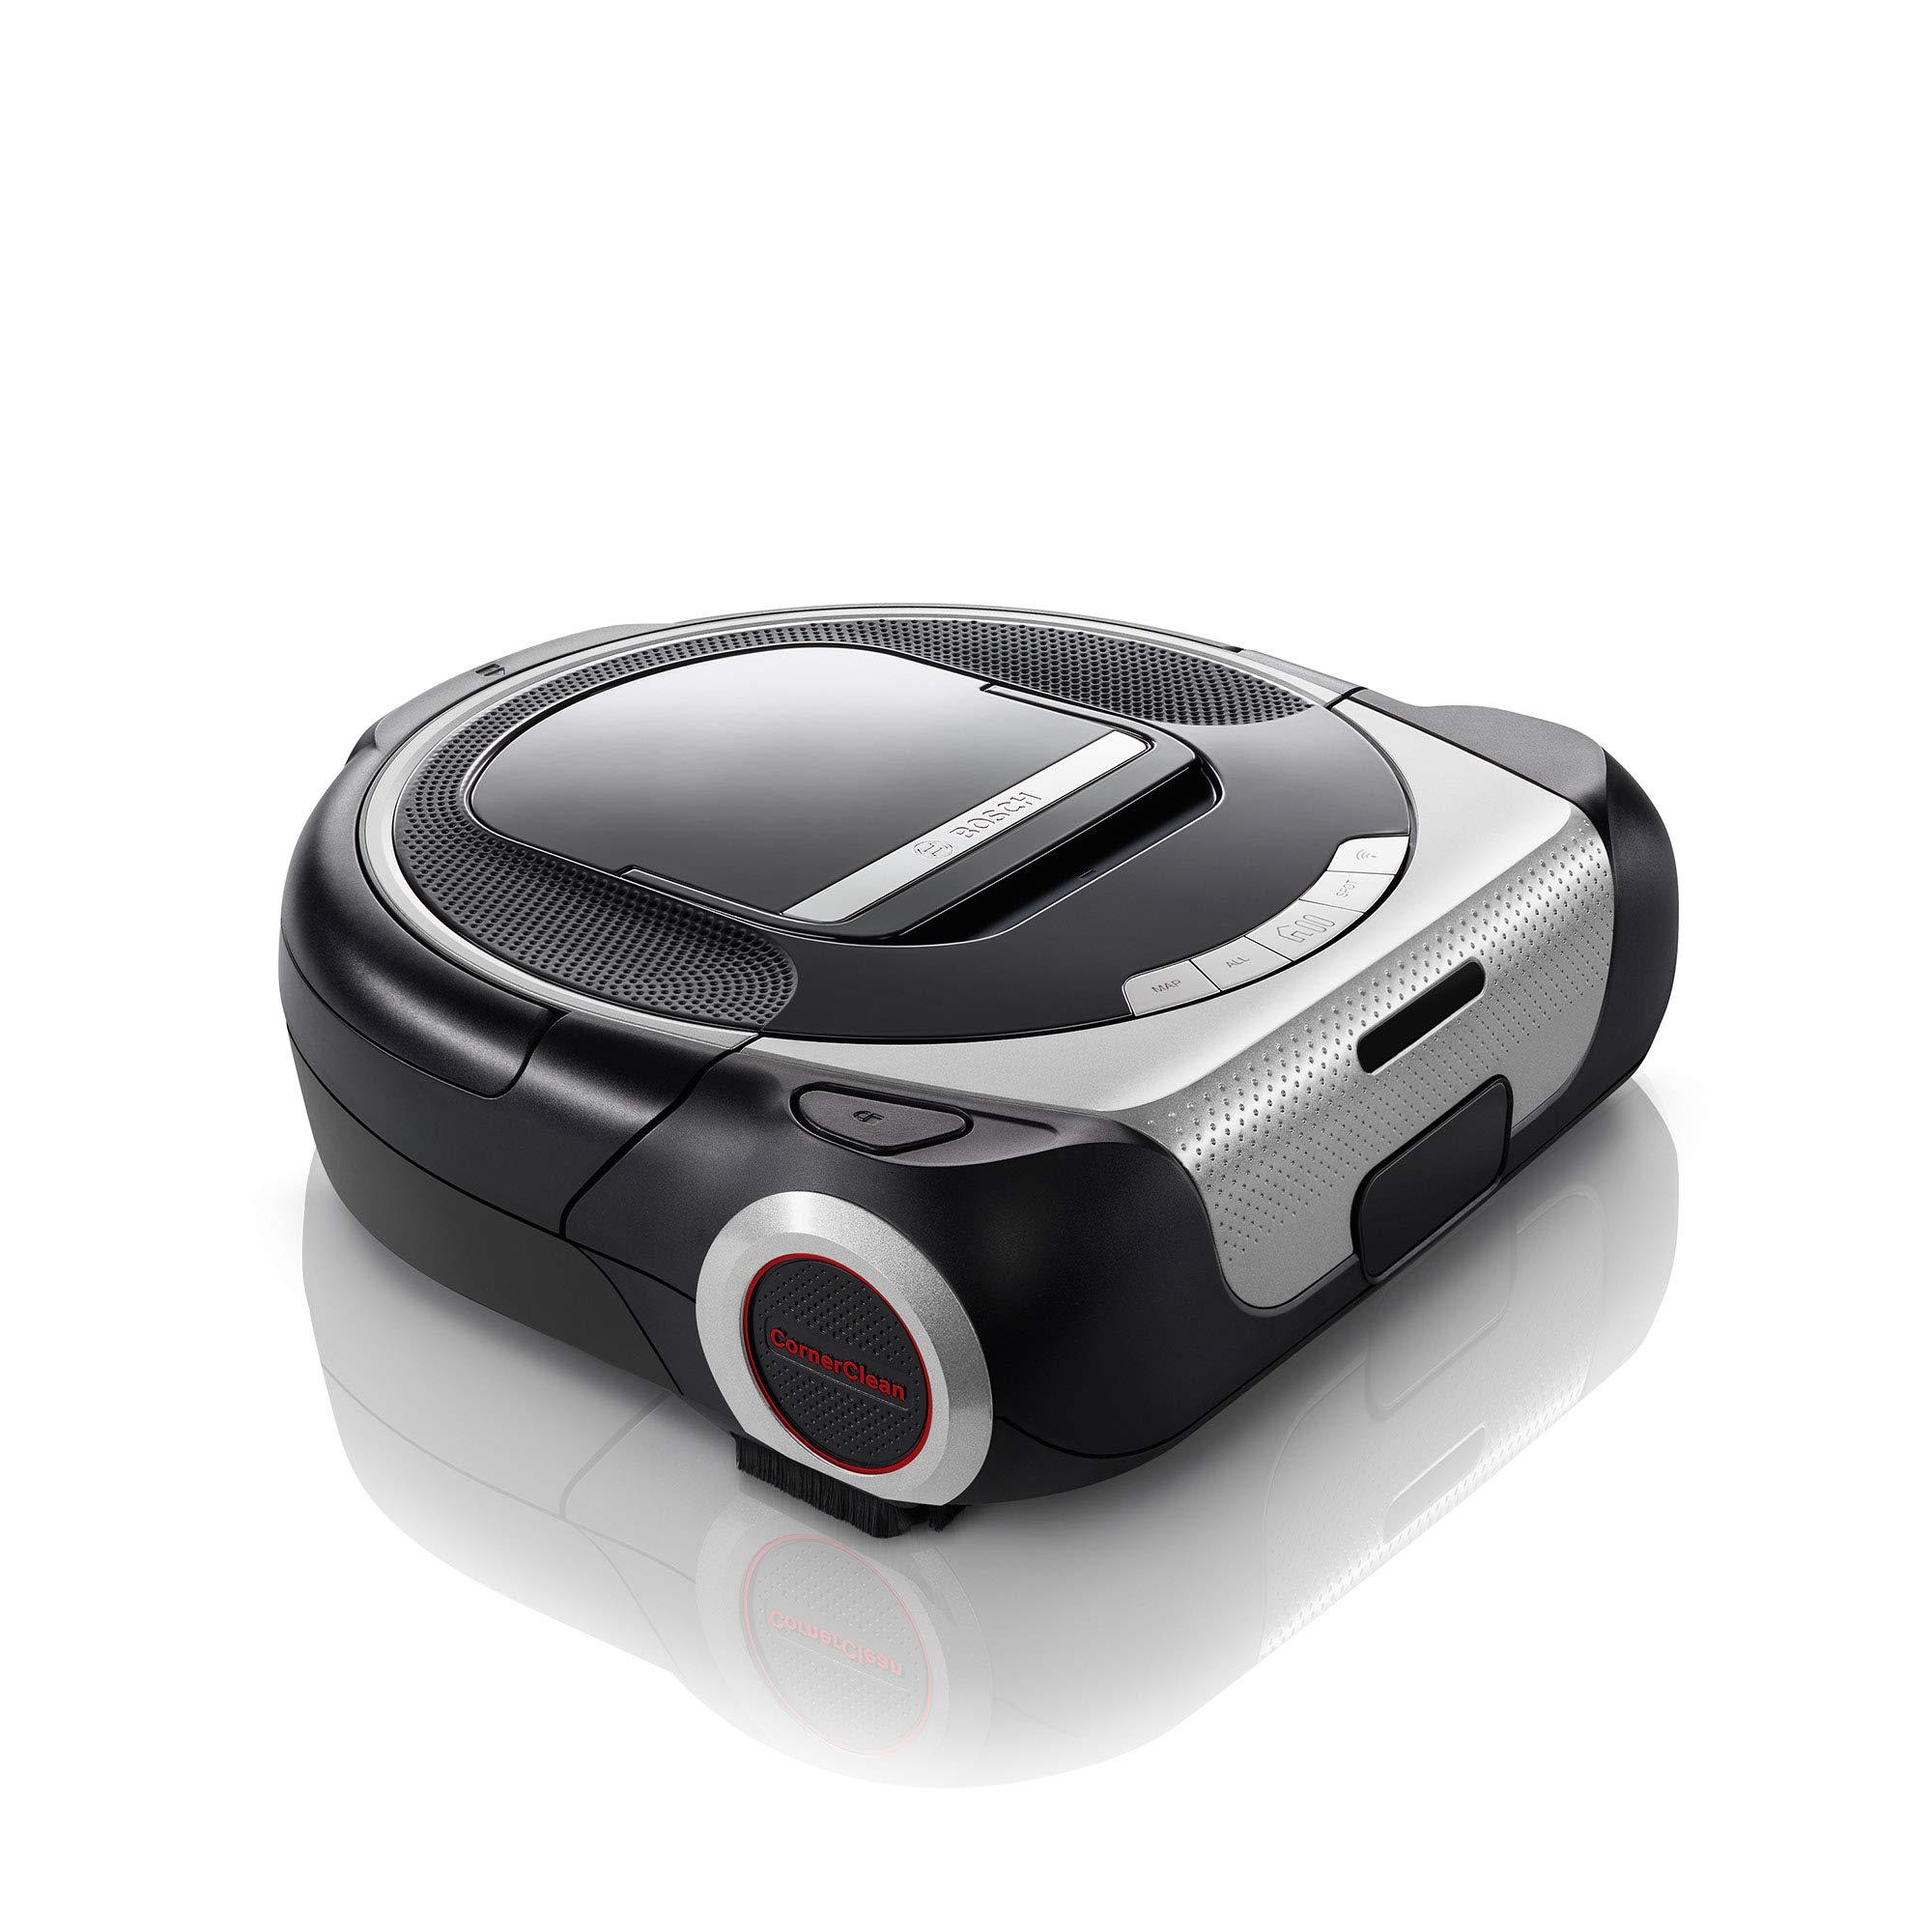 Bosch Roxxter Serie 6 BCR1ACDE - Robot Aspirador, Color Plateado y Negro: Amazon.es: Hogar